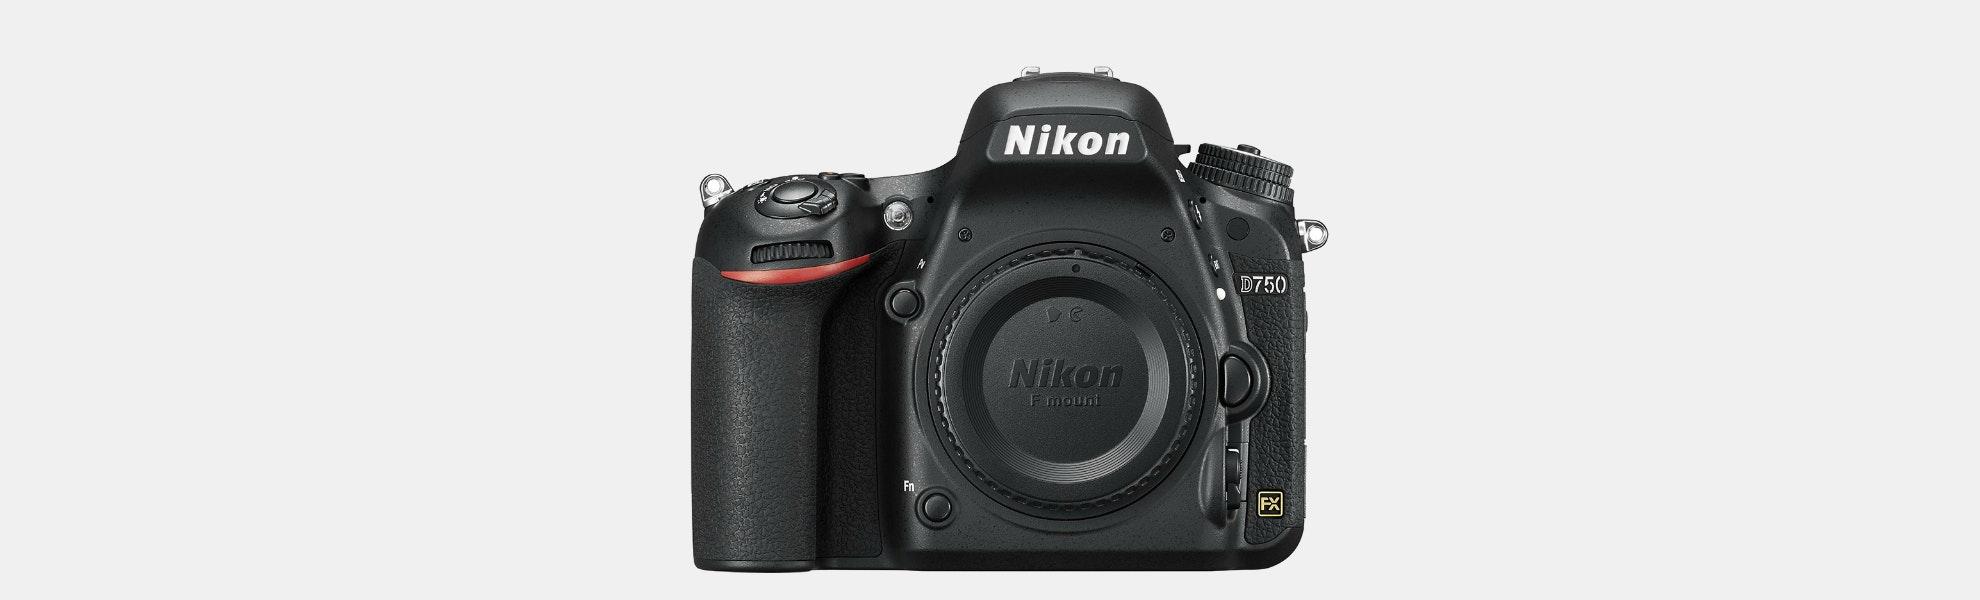 Nikon D750 Digital SLR Camera (Body) Refurbished